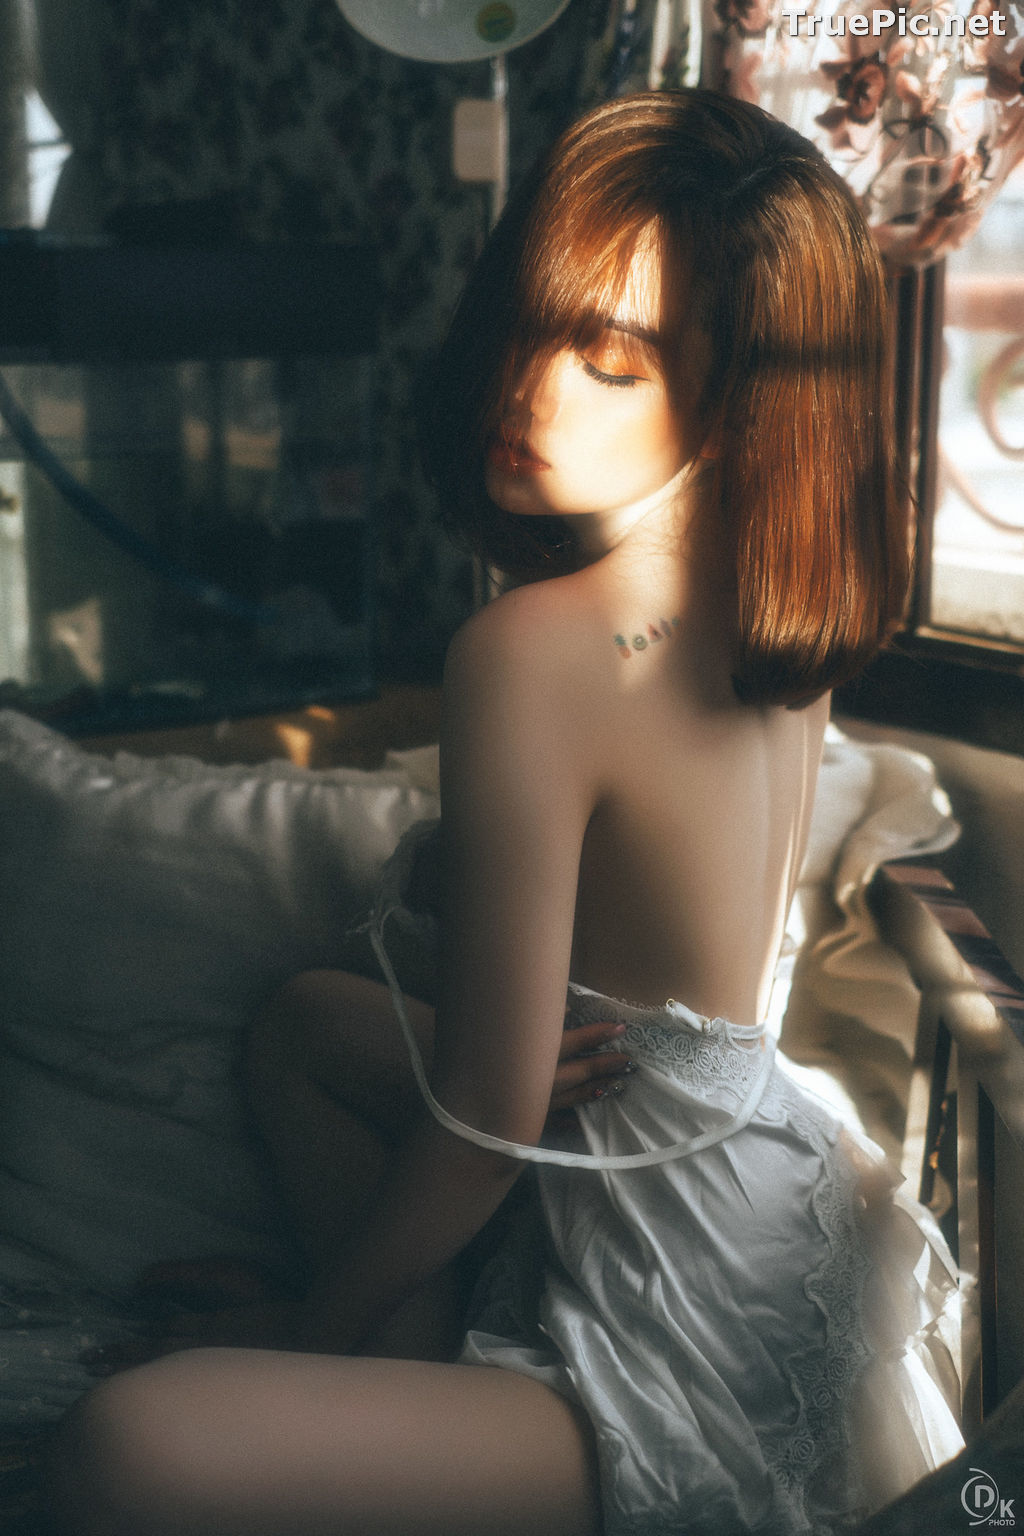 Image Vietnamese Hot Model - Sleepwear and Lingerie Under Dawnlight - TruePic.net - Picture-10